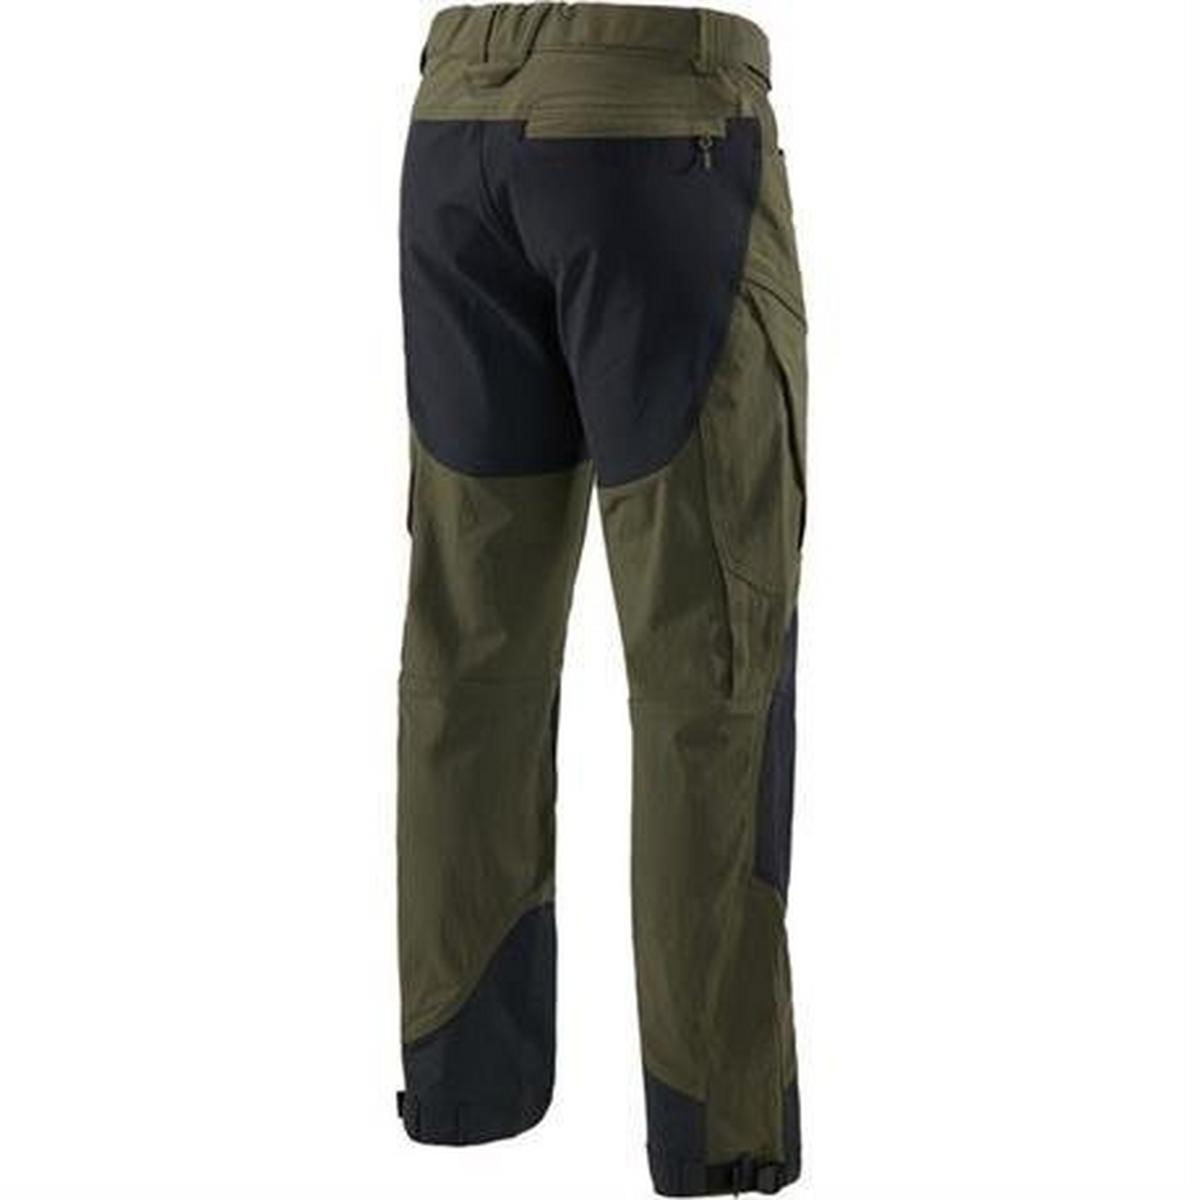 Haglofs Pant Men's Rugged Mountain REGULAR Leg Trousers Deep Woods/Black